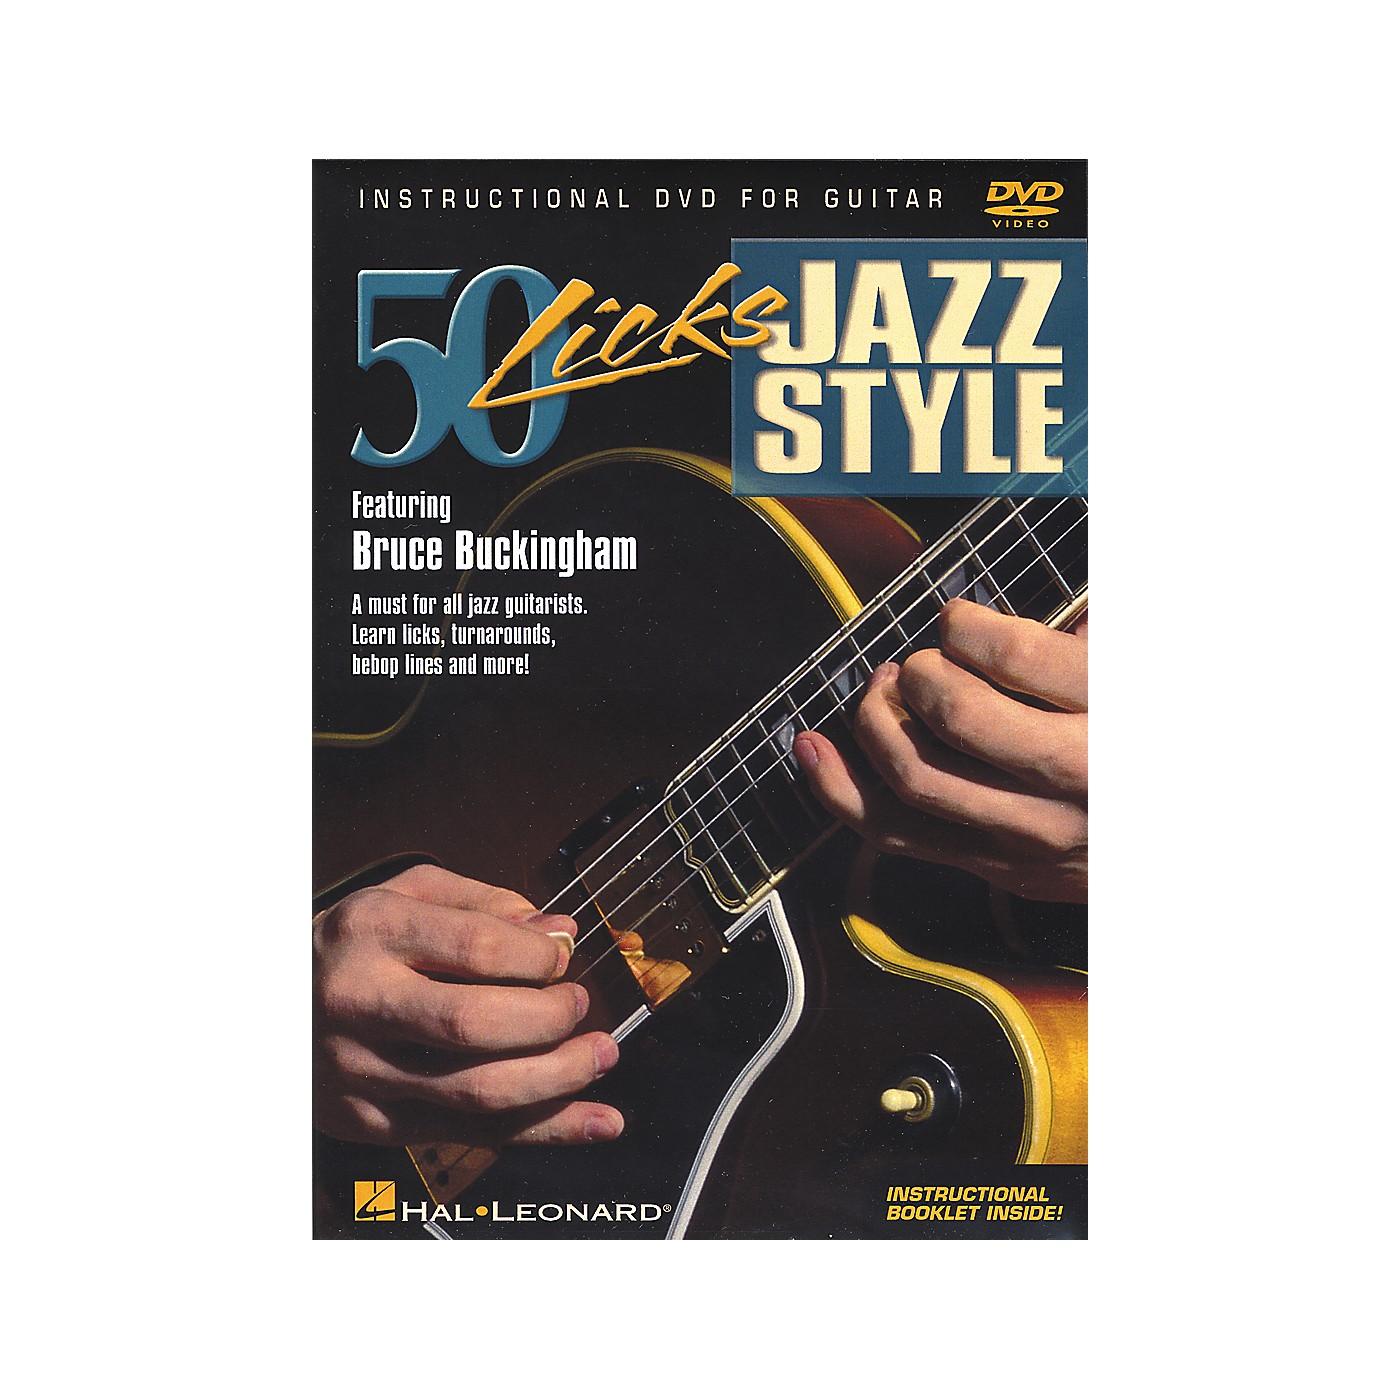 Hal Leonard 50 Licks Jazz Style DVD thumbnail